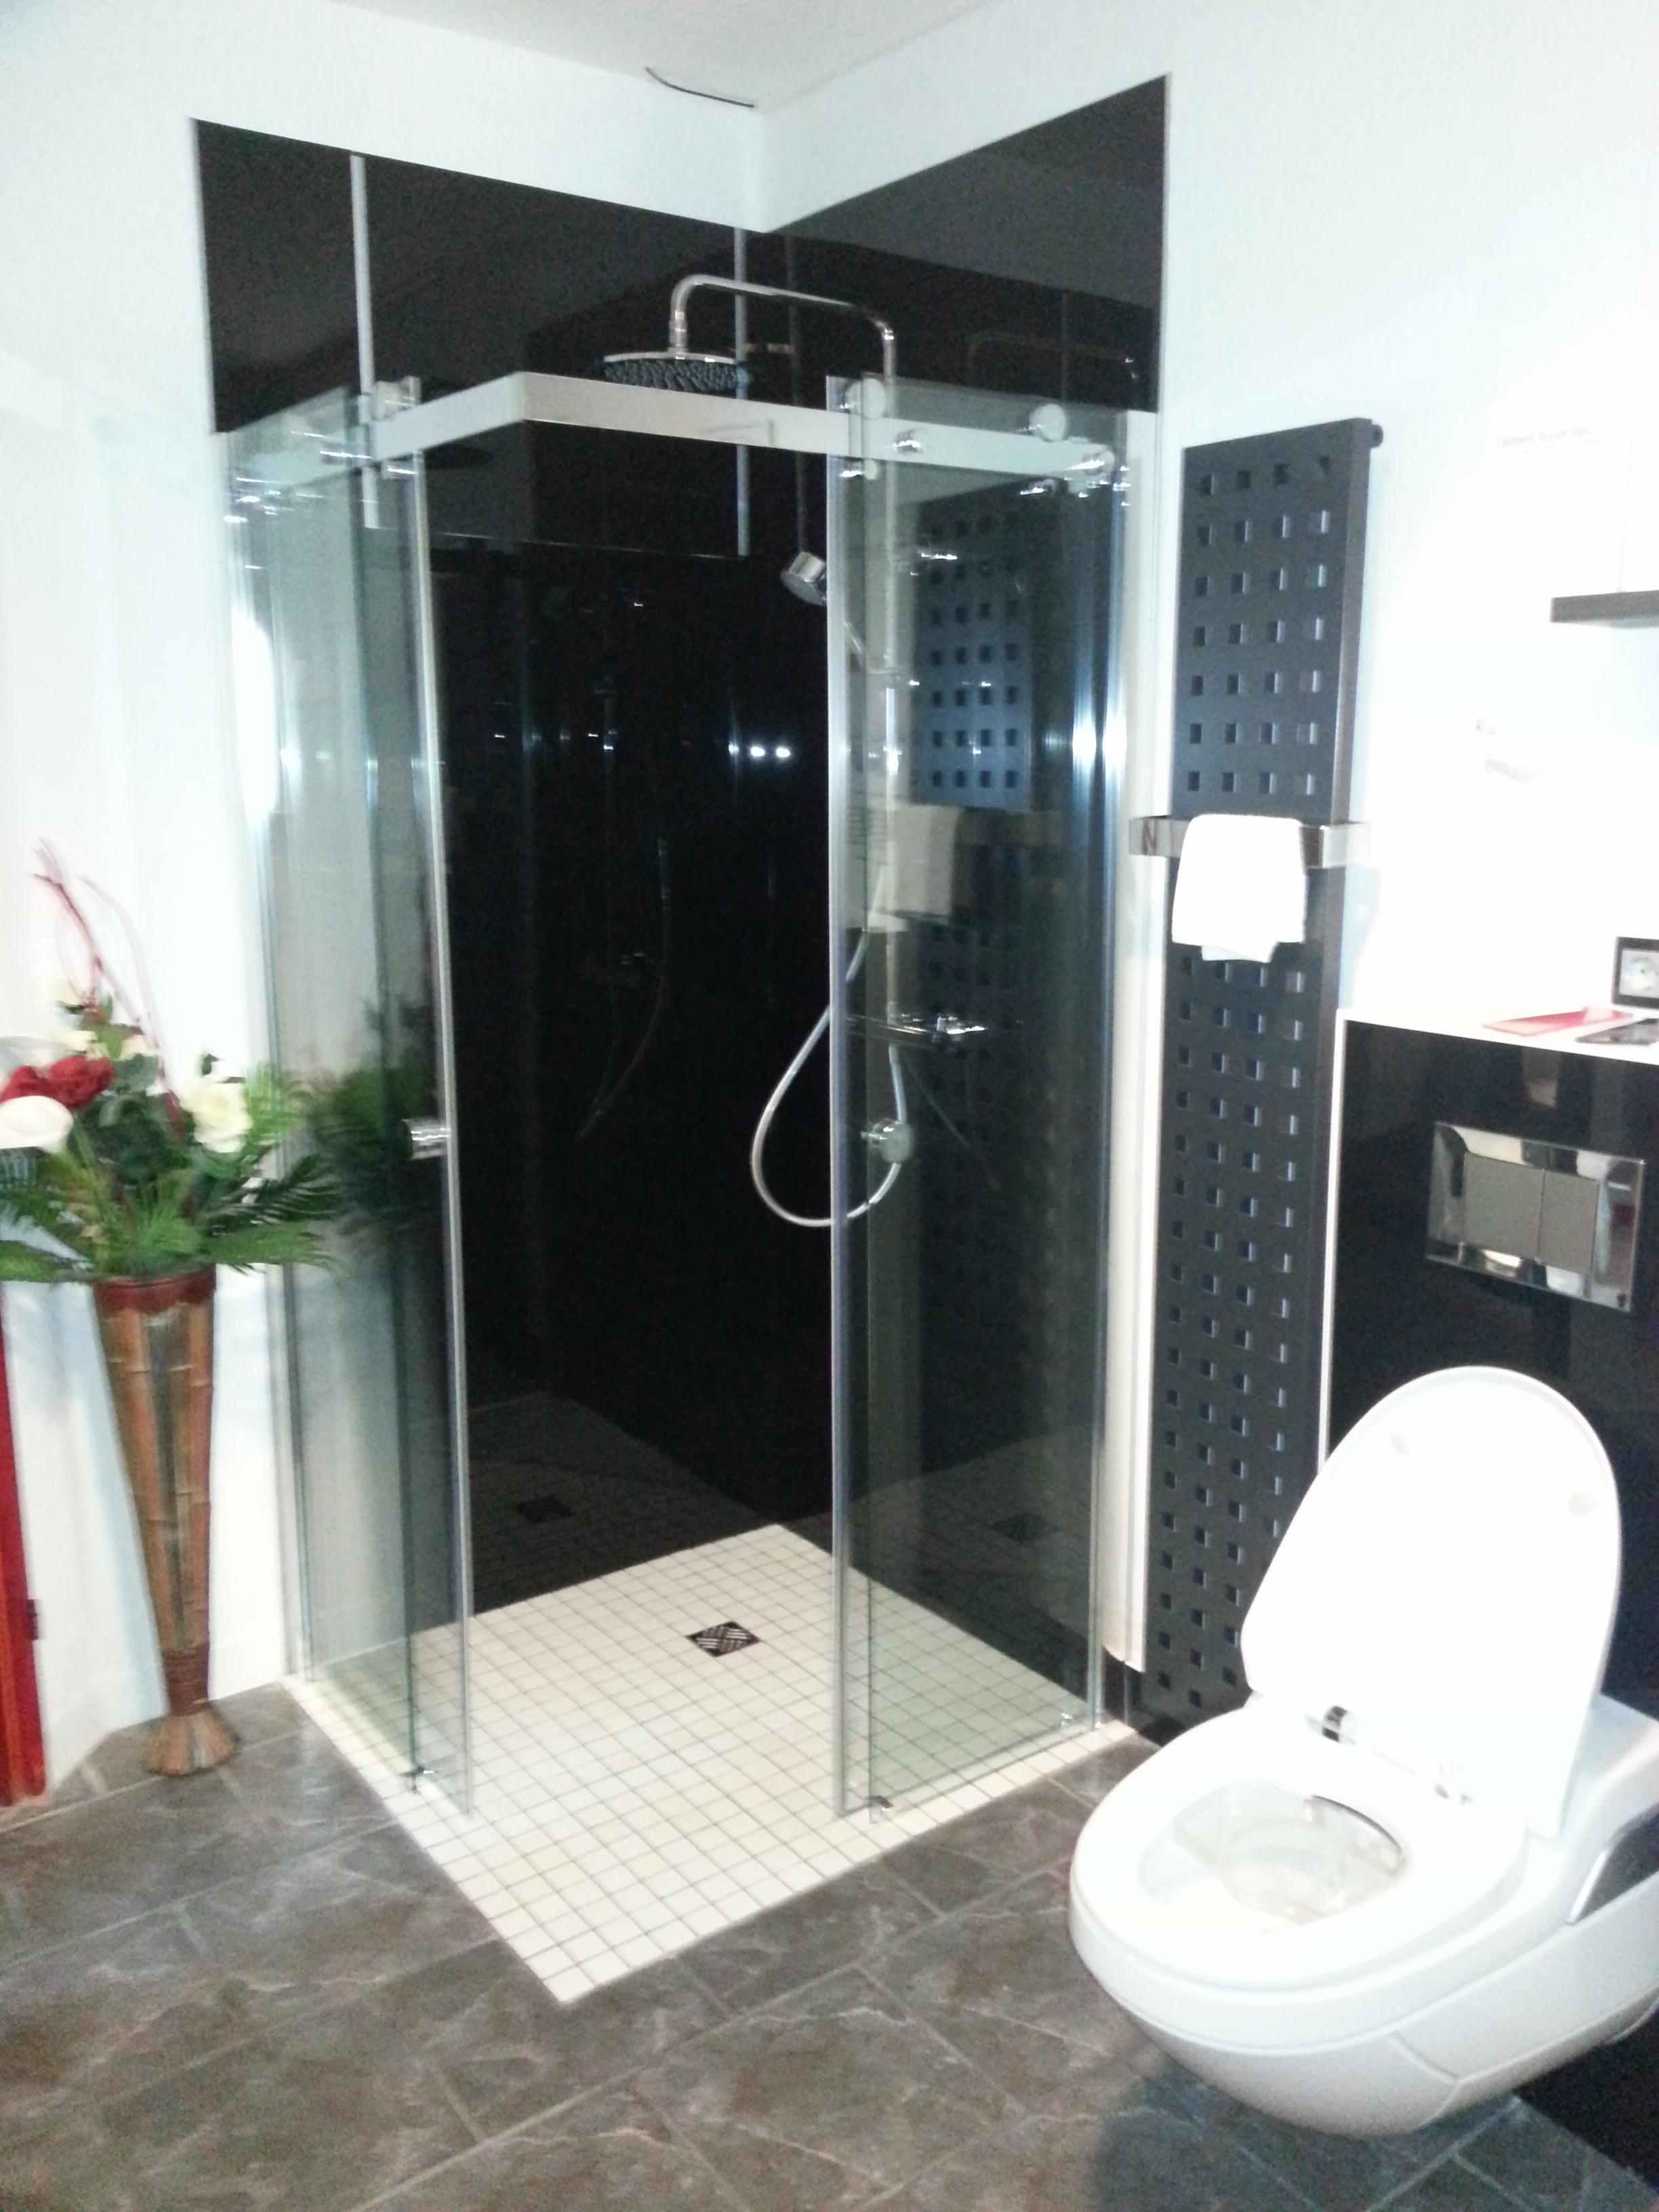 gerd nolte heizung sanit r bad renovierung. Black Bedroom Furniture Sets. Home Design Ideas